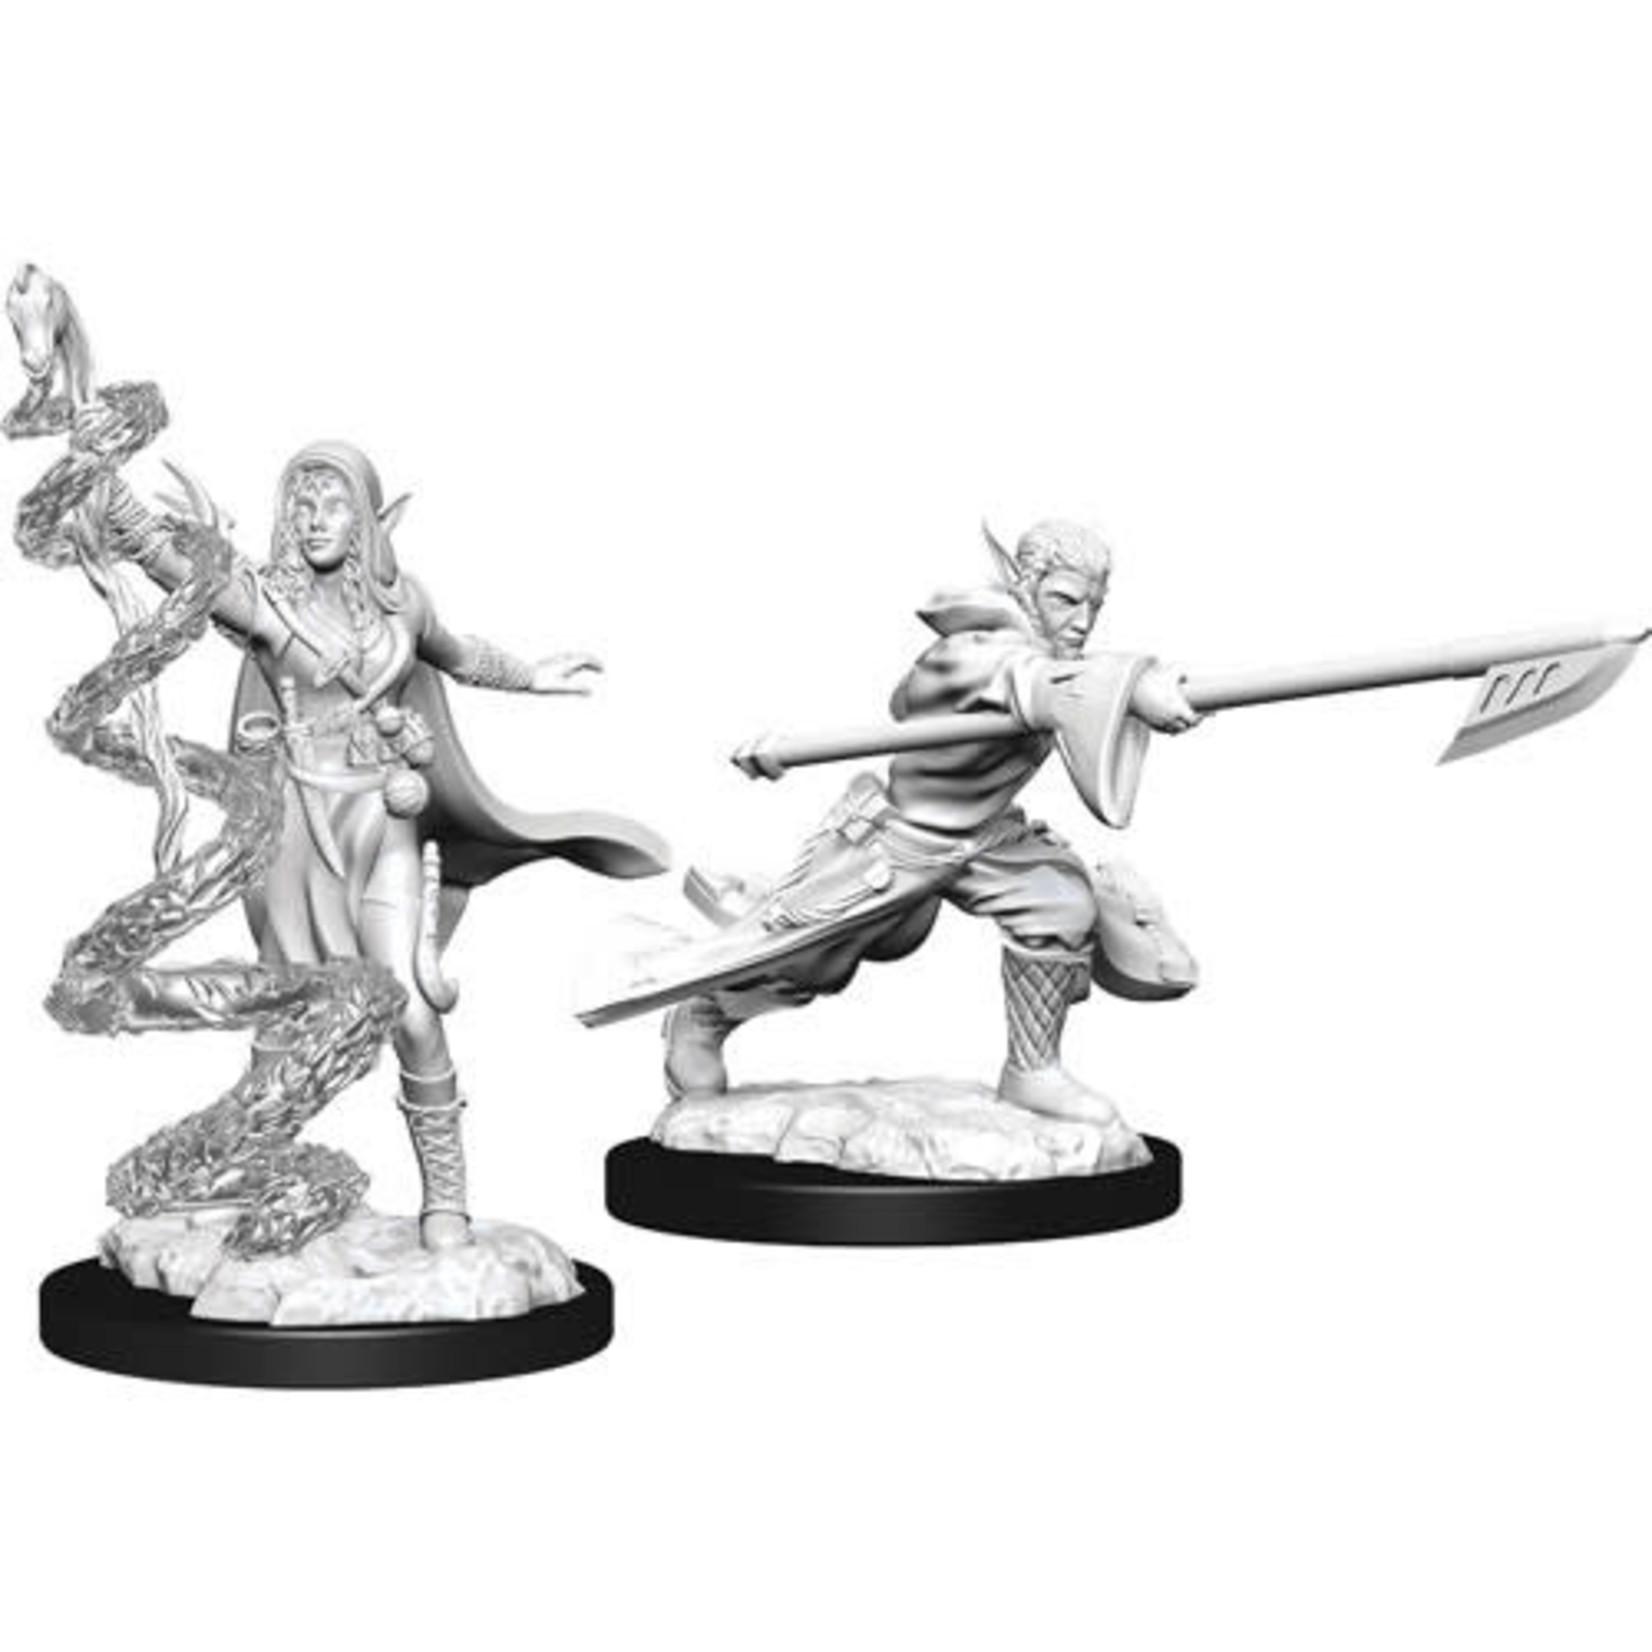 D&D Unpainted Minis: Joraga Warcaller & Joraga Treespeaker (Wave 13)